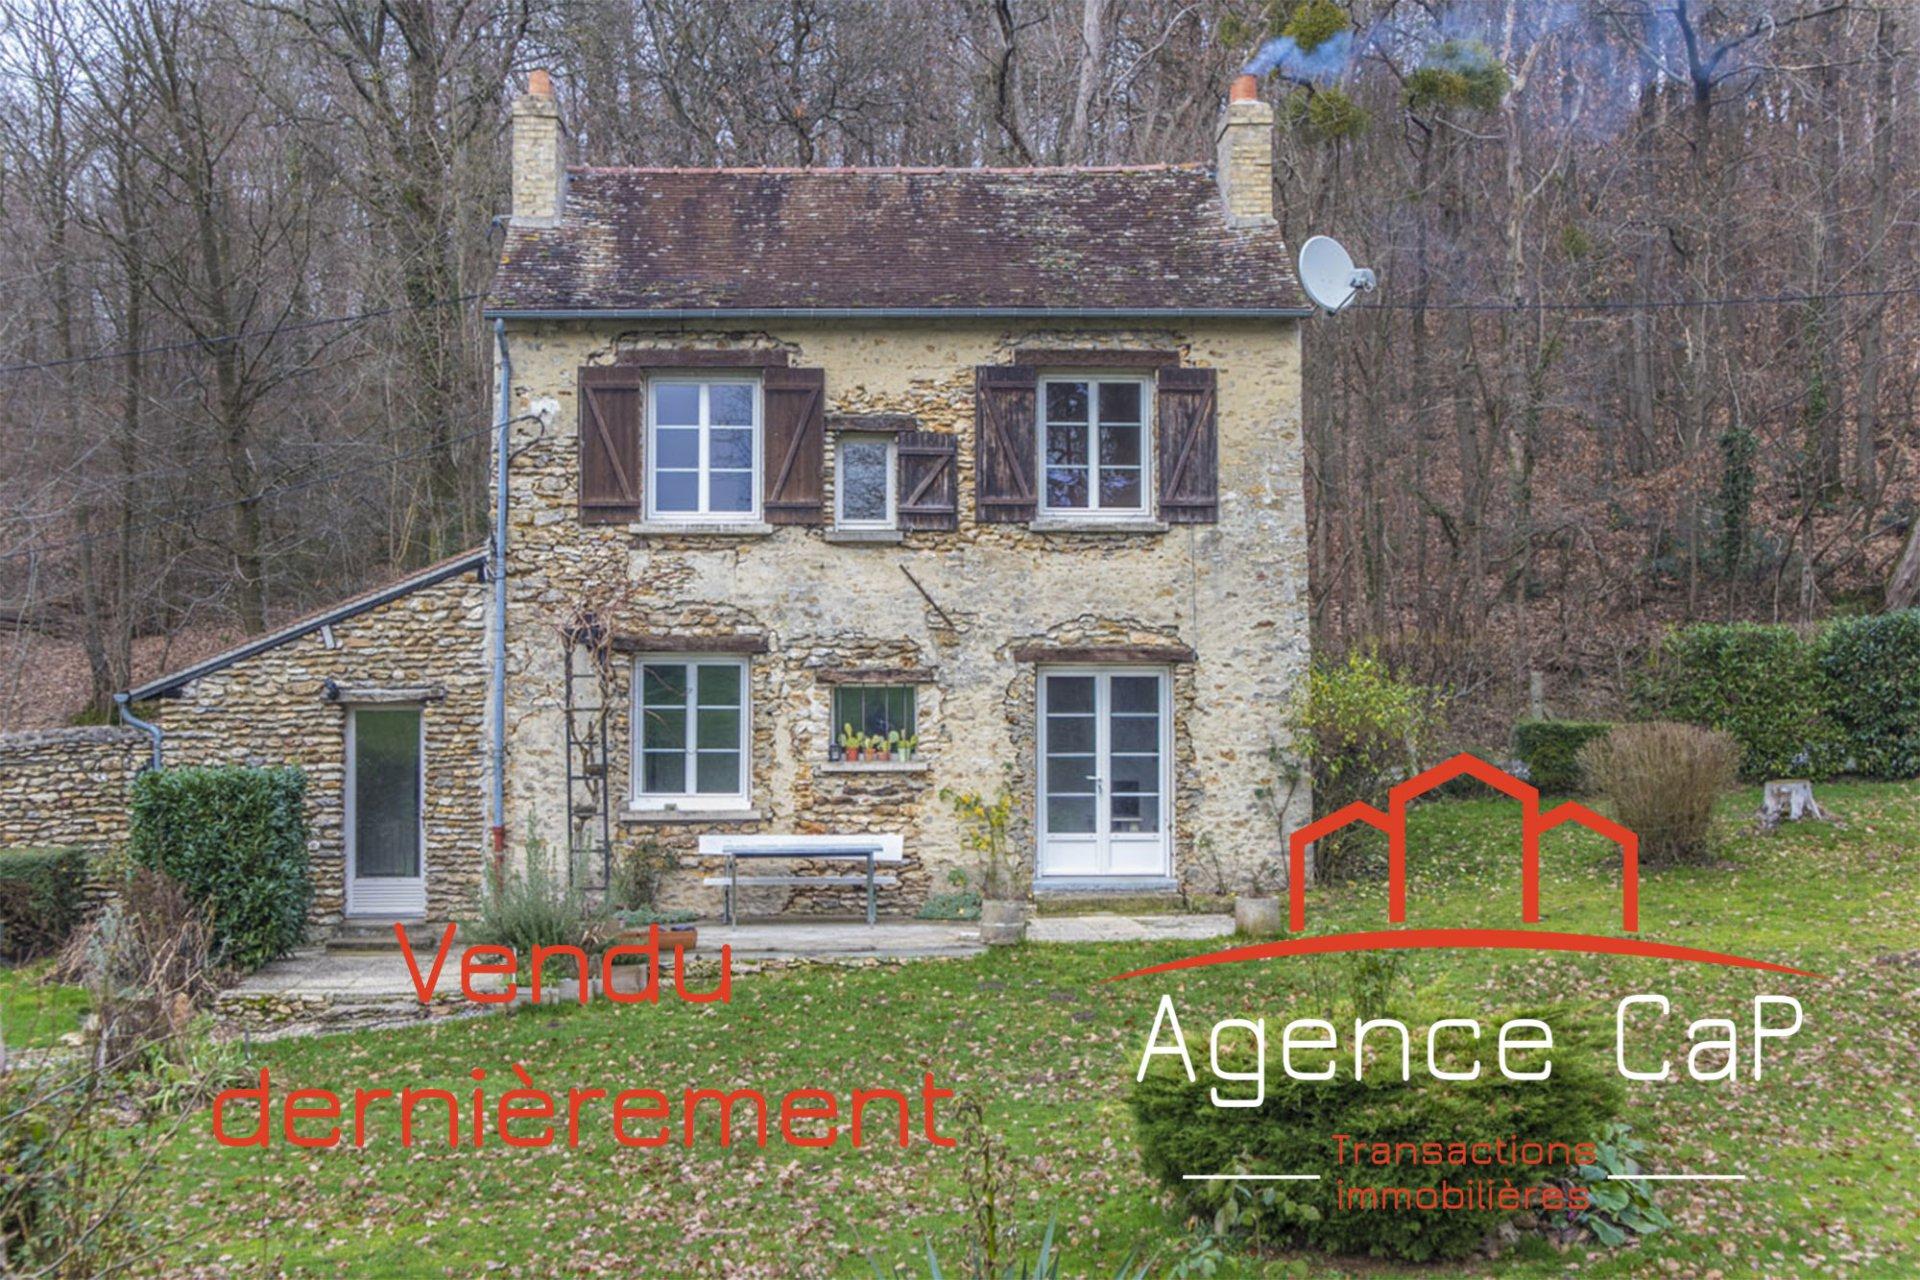 Vente Maison - Montfort-l'Amaury